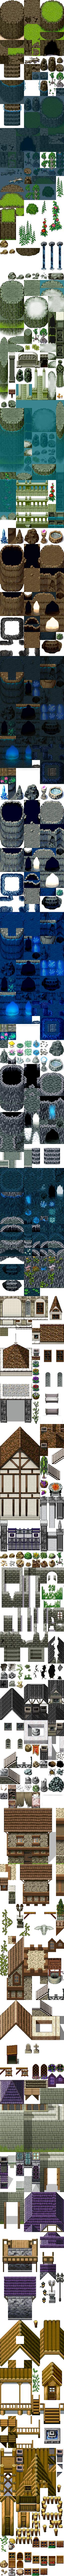 Tileset de caverna Valkyrie_stories_ultimate_xp_tileset_by_morphy15-d4t17wx